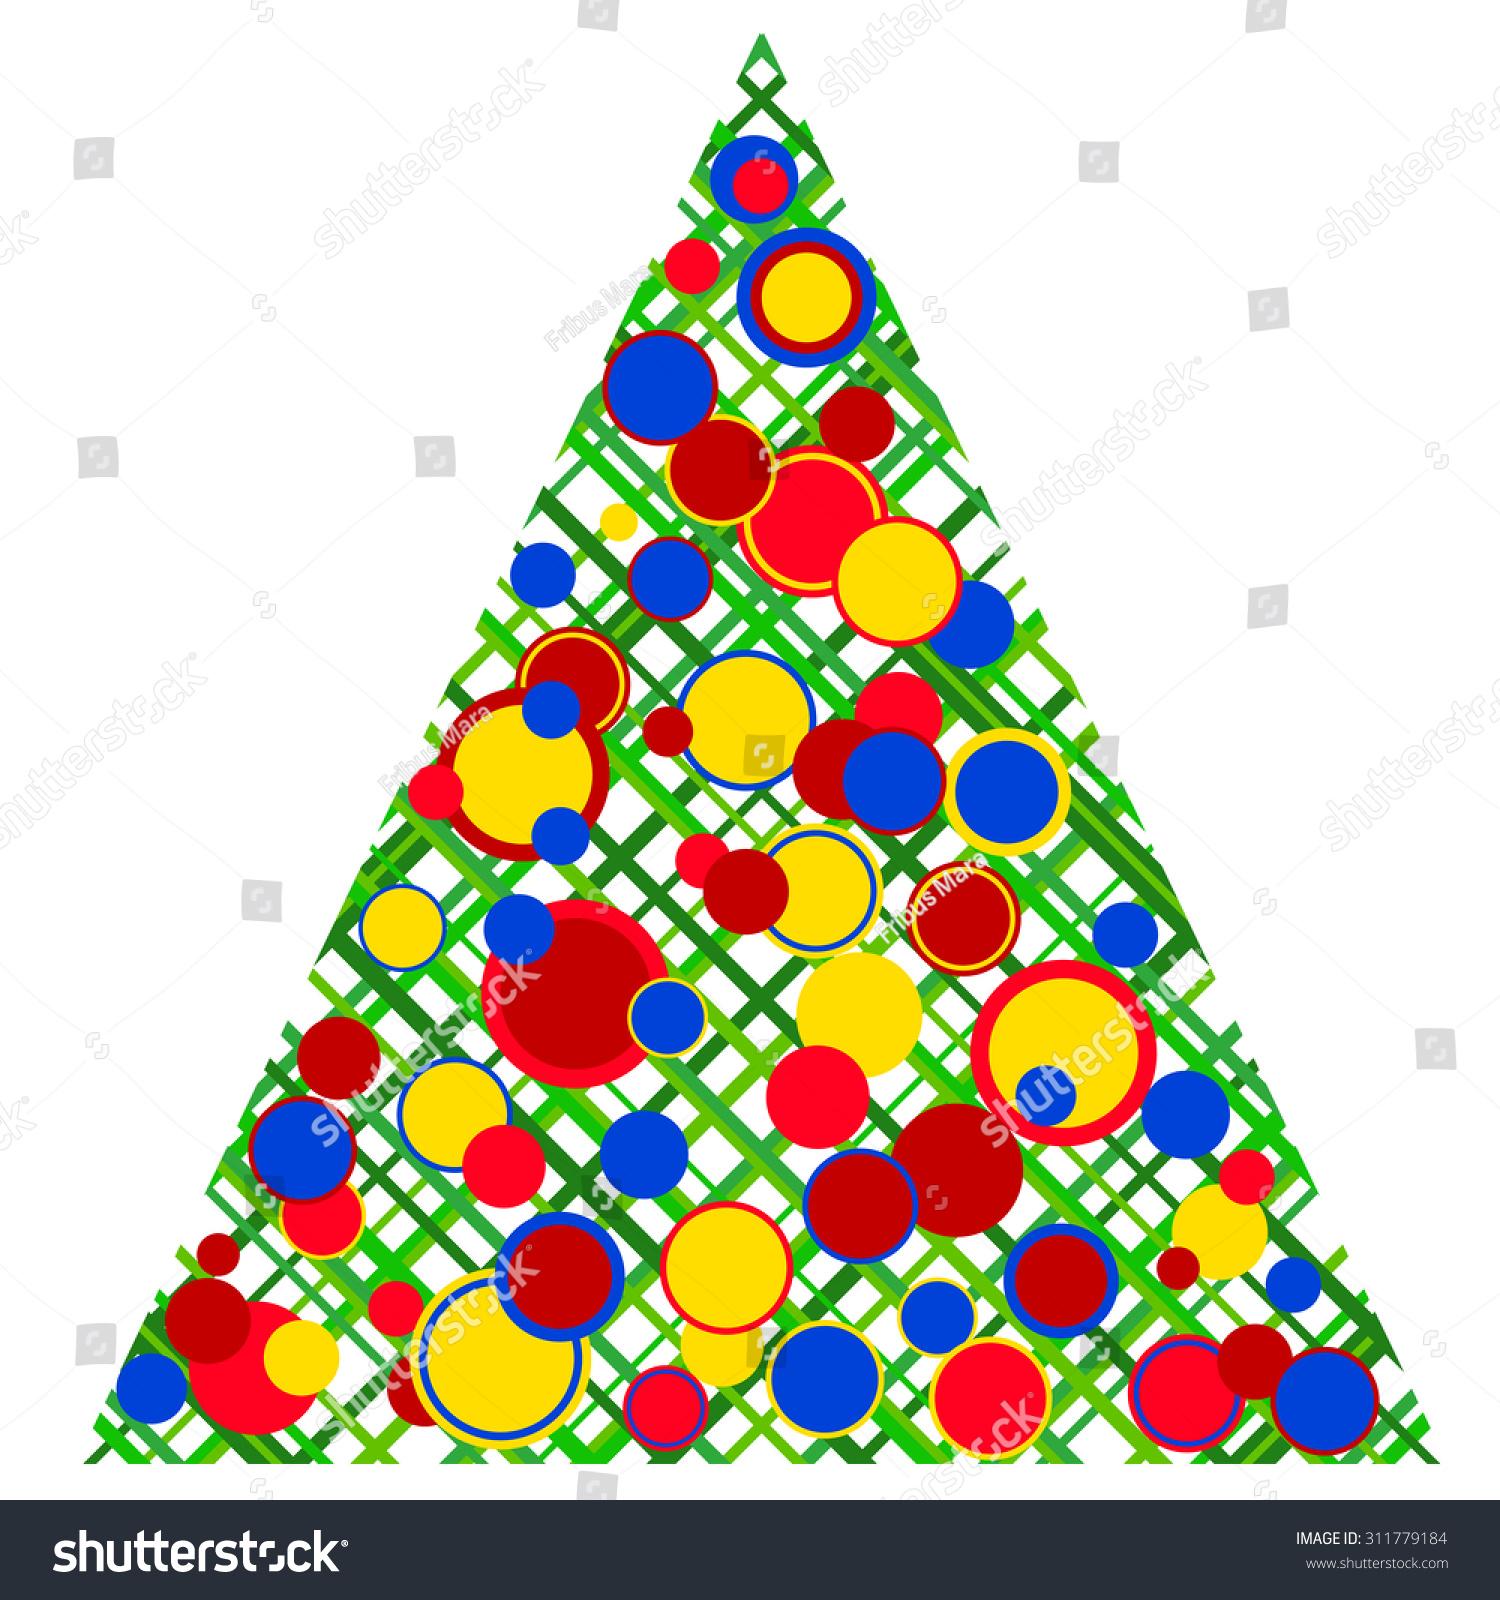 Stylized christmas tree ornaments stock illustration